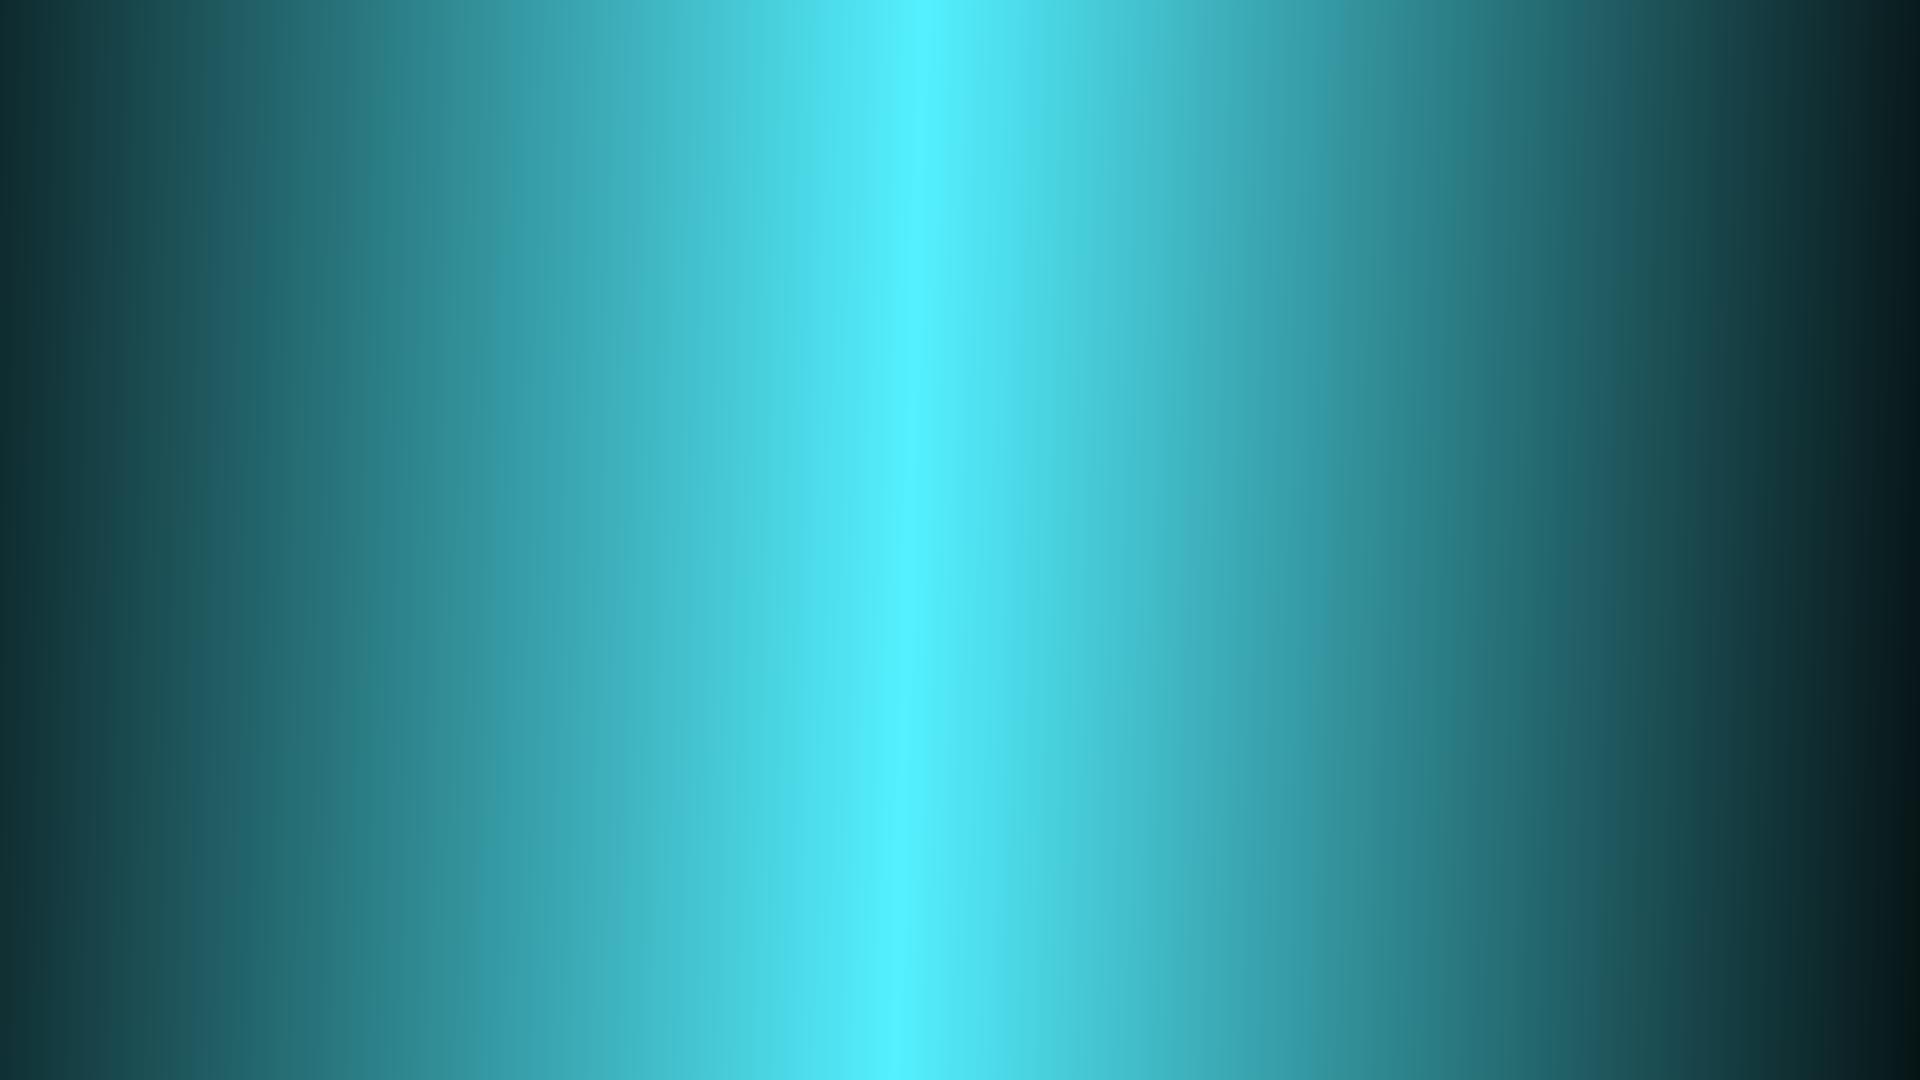 201201Sky Blue and Black Central Gradient Desktop Wallpaperpng 1920x1080